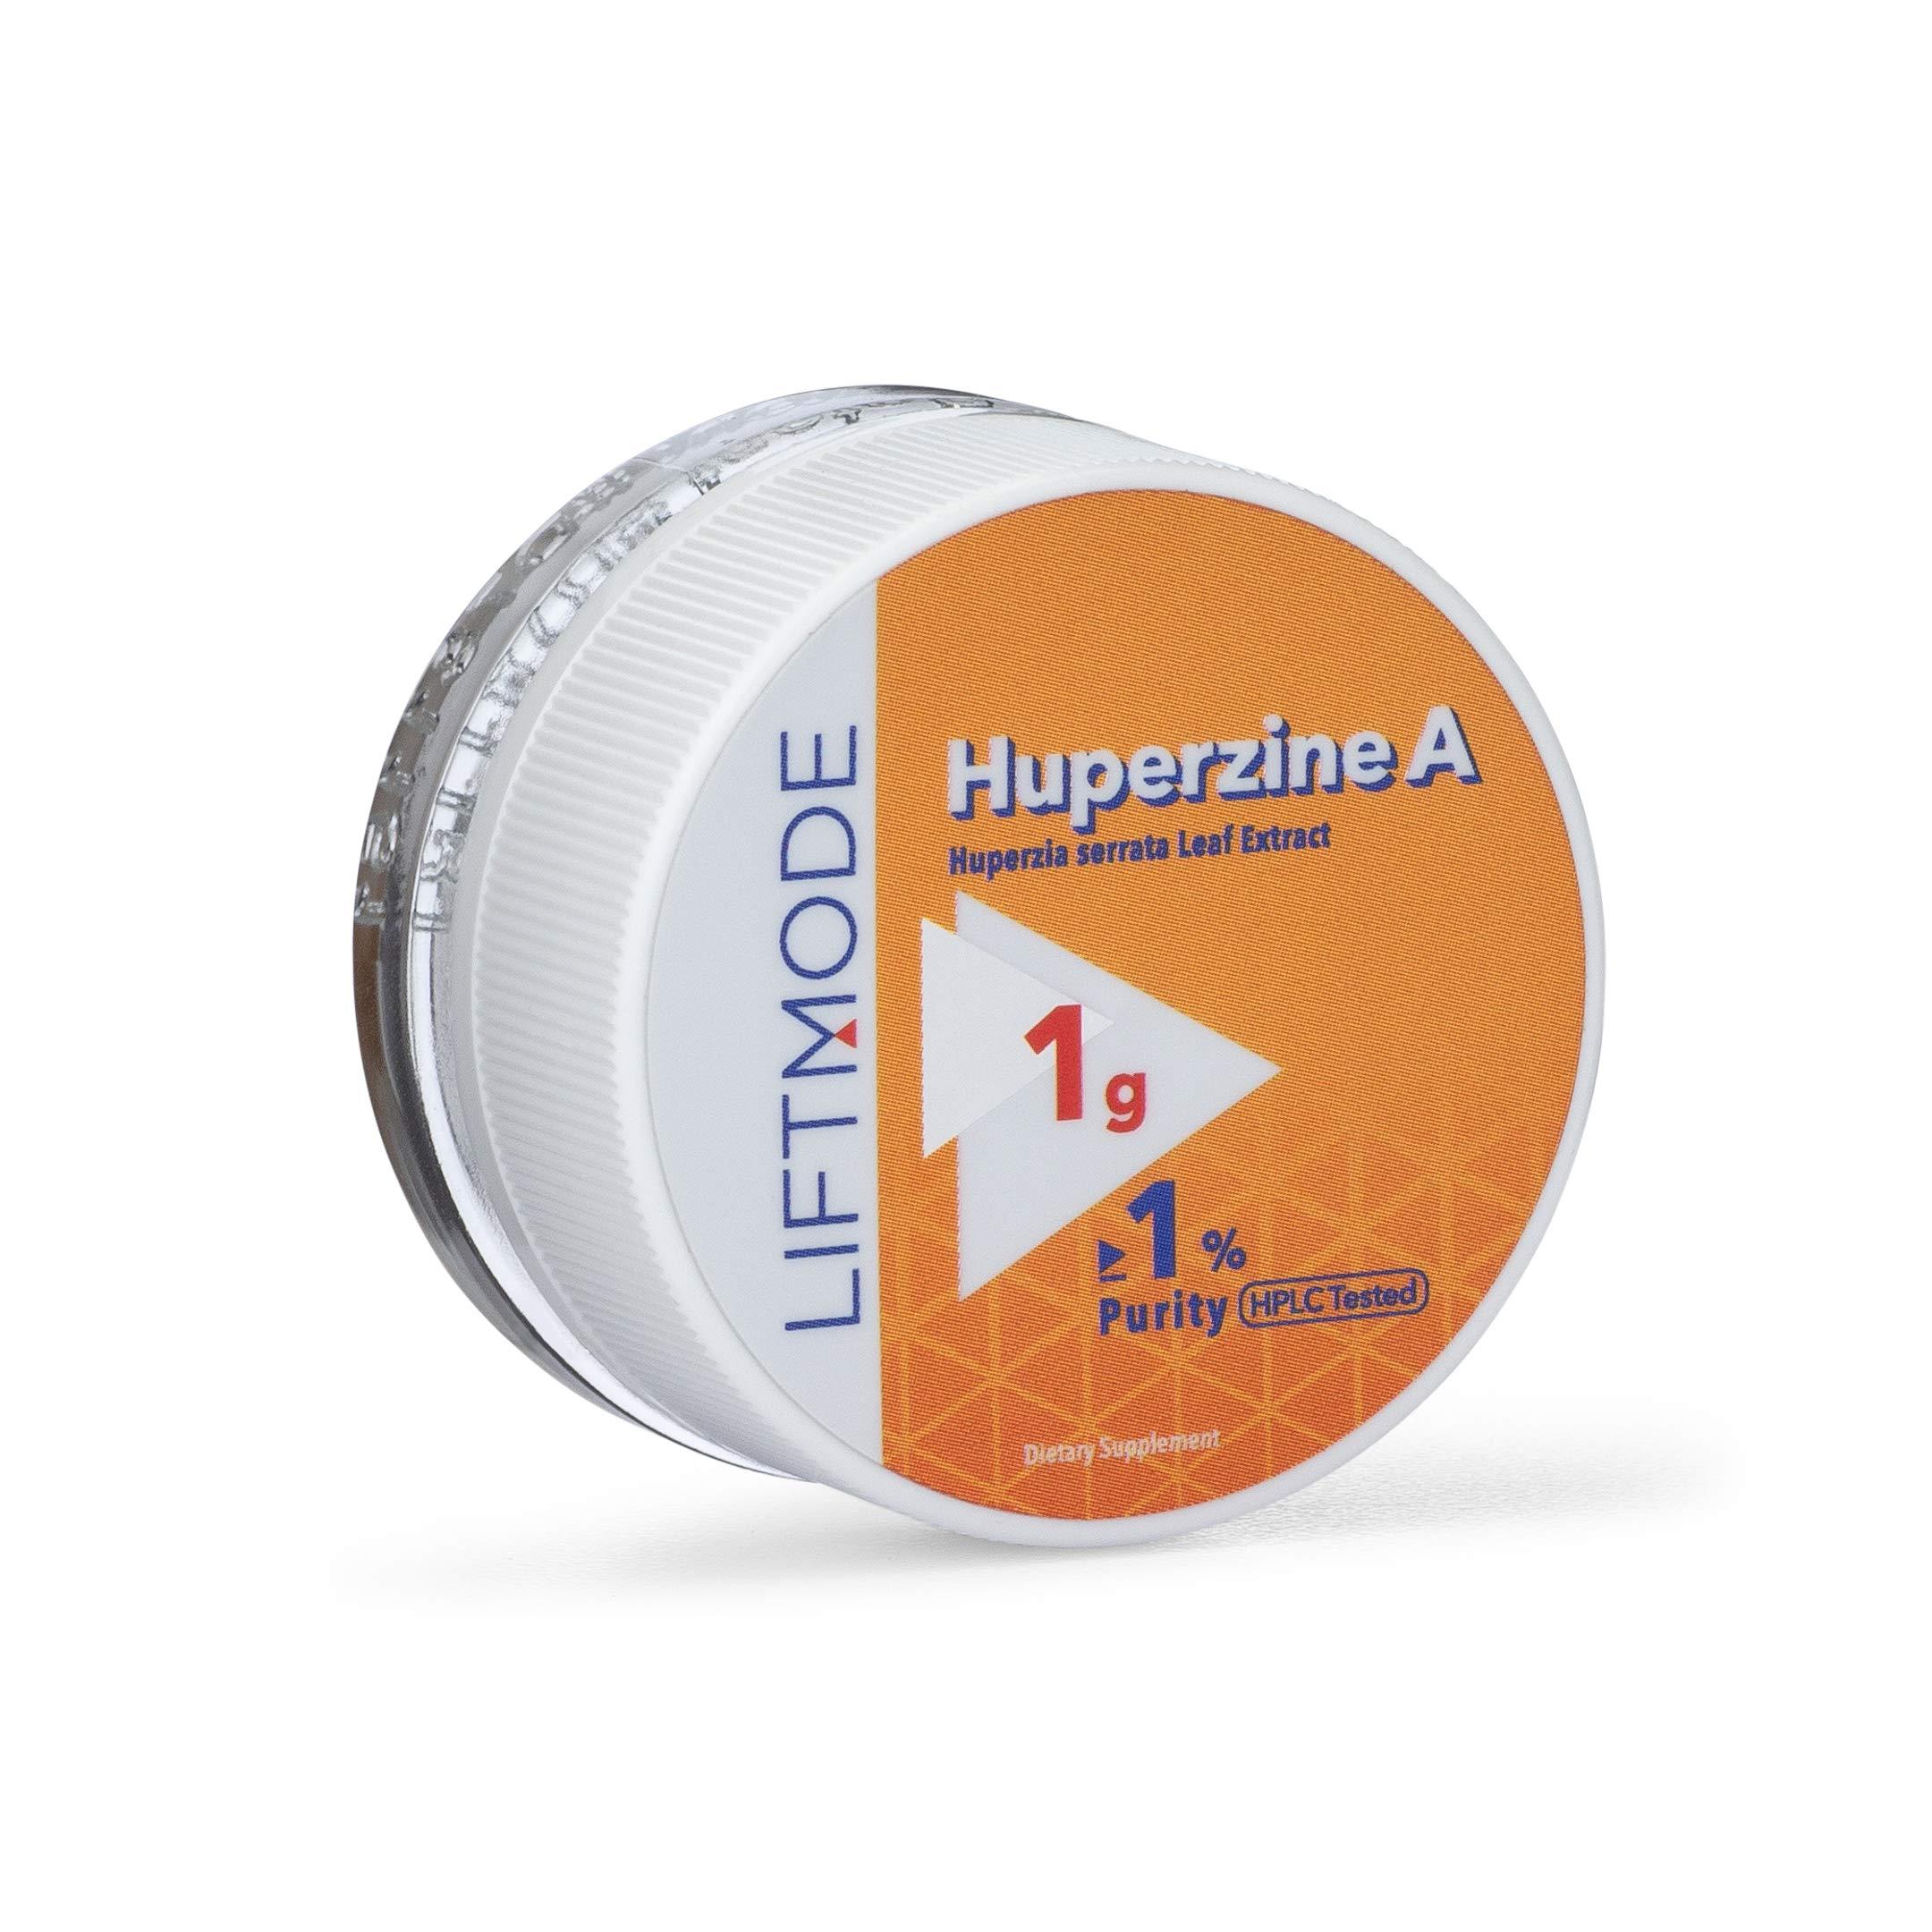 LiftMode Huperzine A Powder Supplement - Supports Focus & Cognition, Enhances Memory & Learning Ability, Huperzia Serrata Extract | Vegetarian, Vegan, Non-GMO, Gluten Free - 1 Gram (50 Servings)